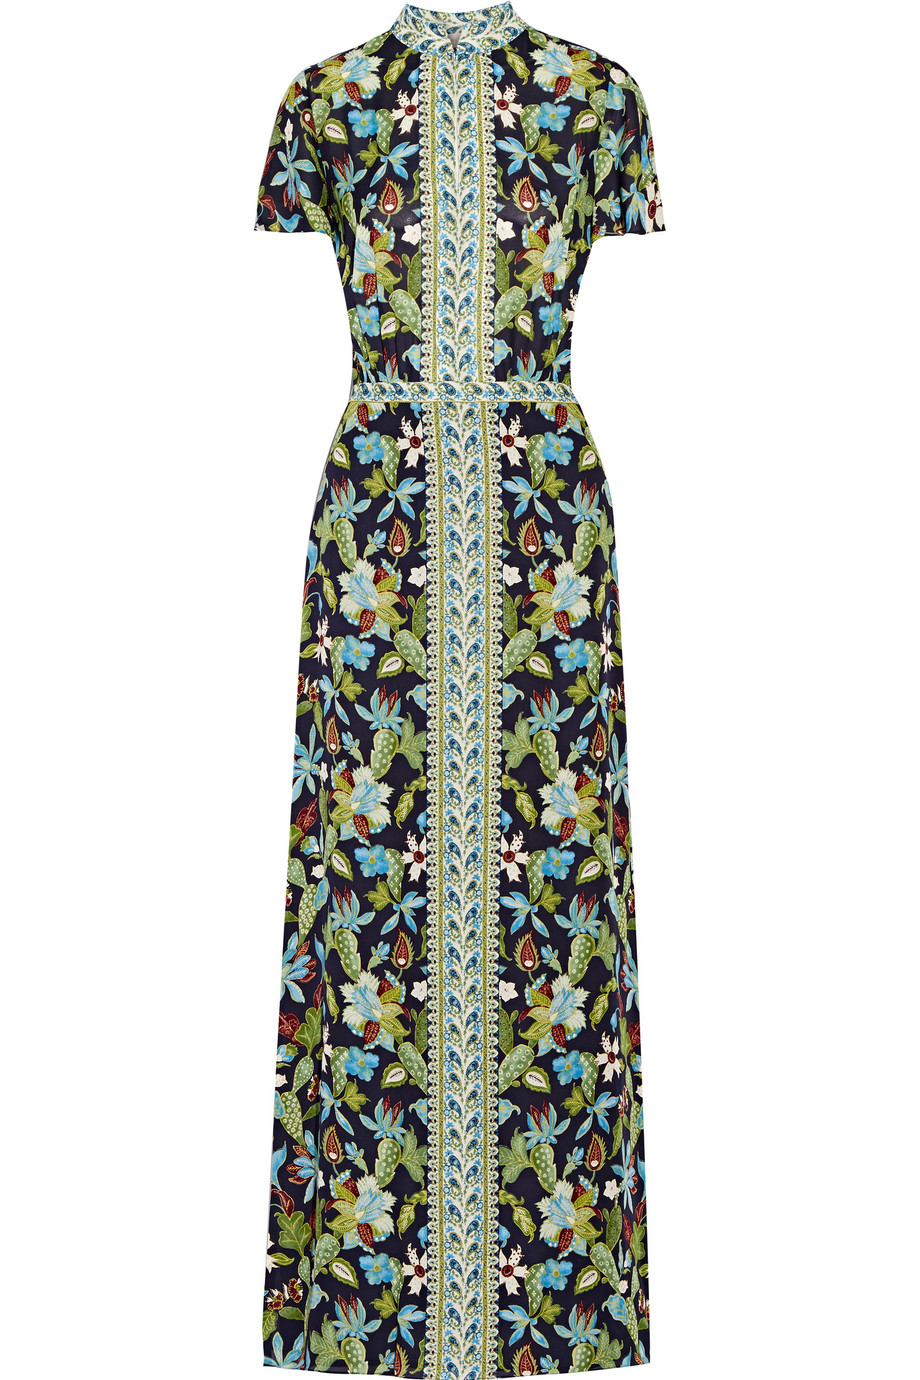 Tory Burch Printed Silk-Chiffon Maxi Dress, Midnight Blue/Leaf Green, Women's - Printed, Size: 6